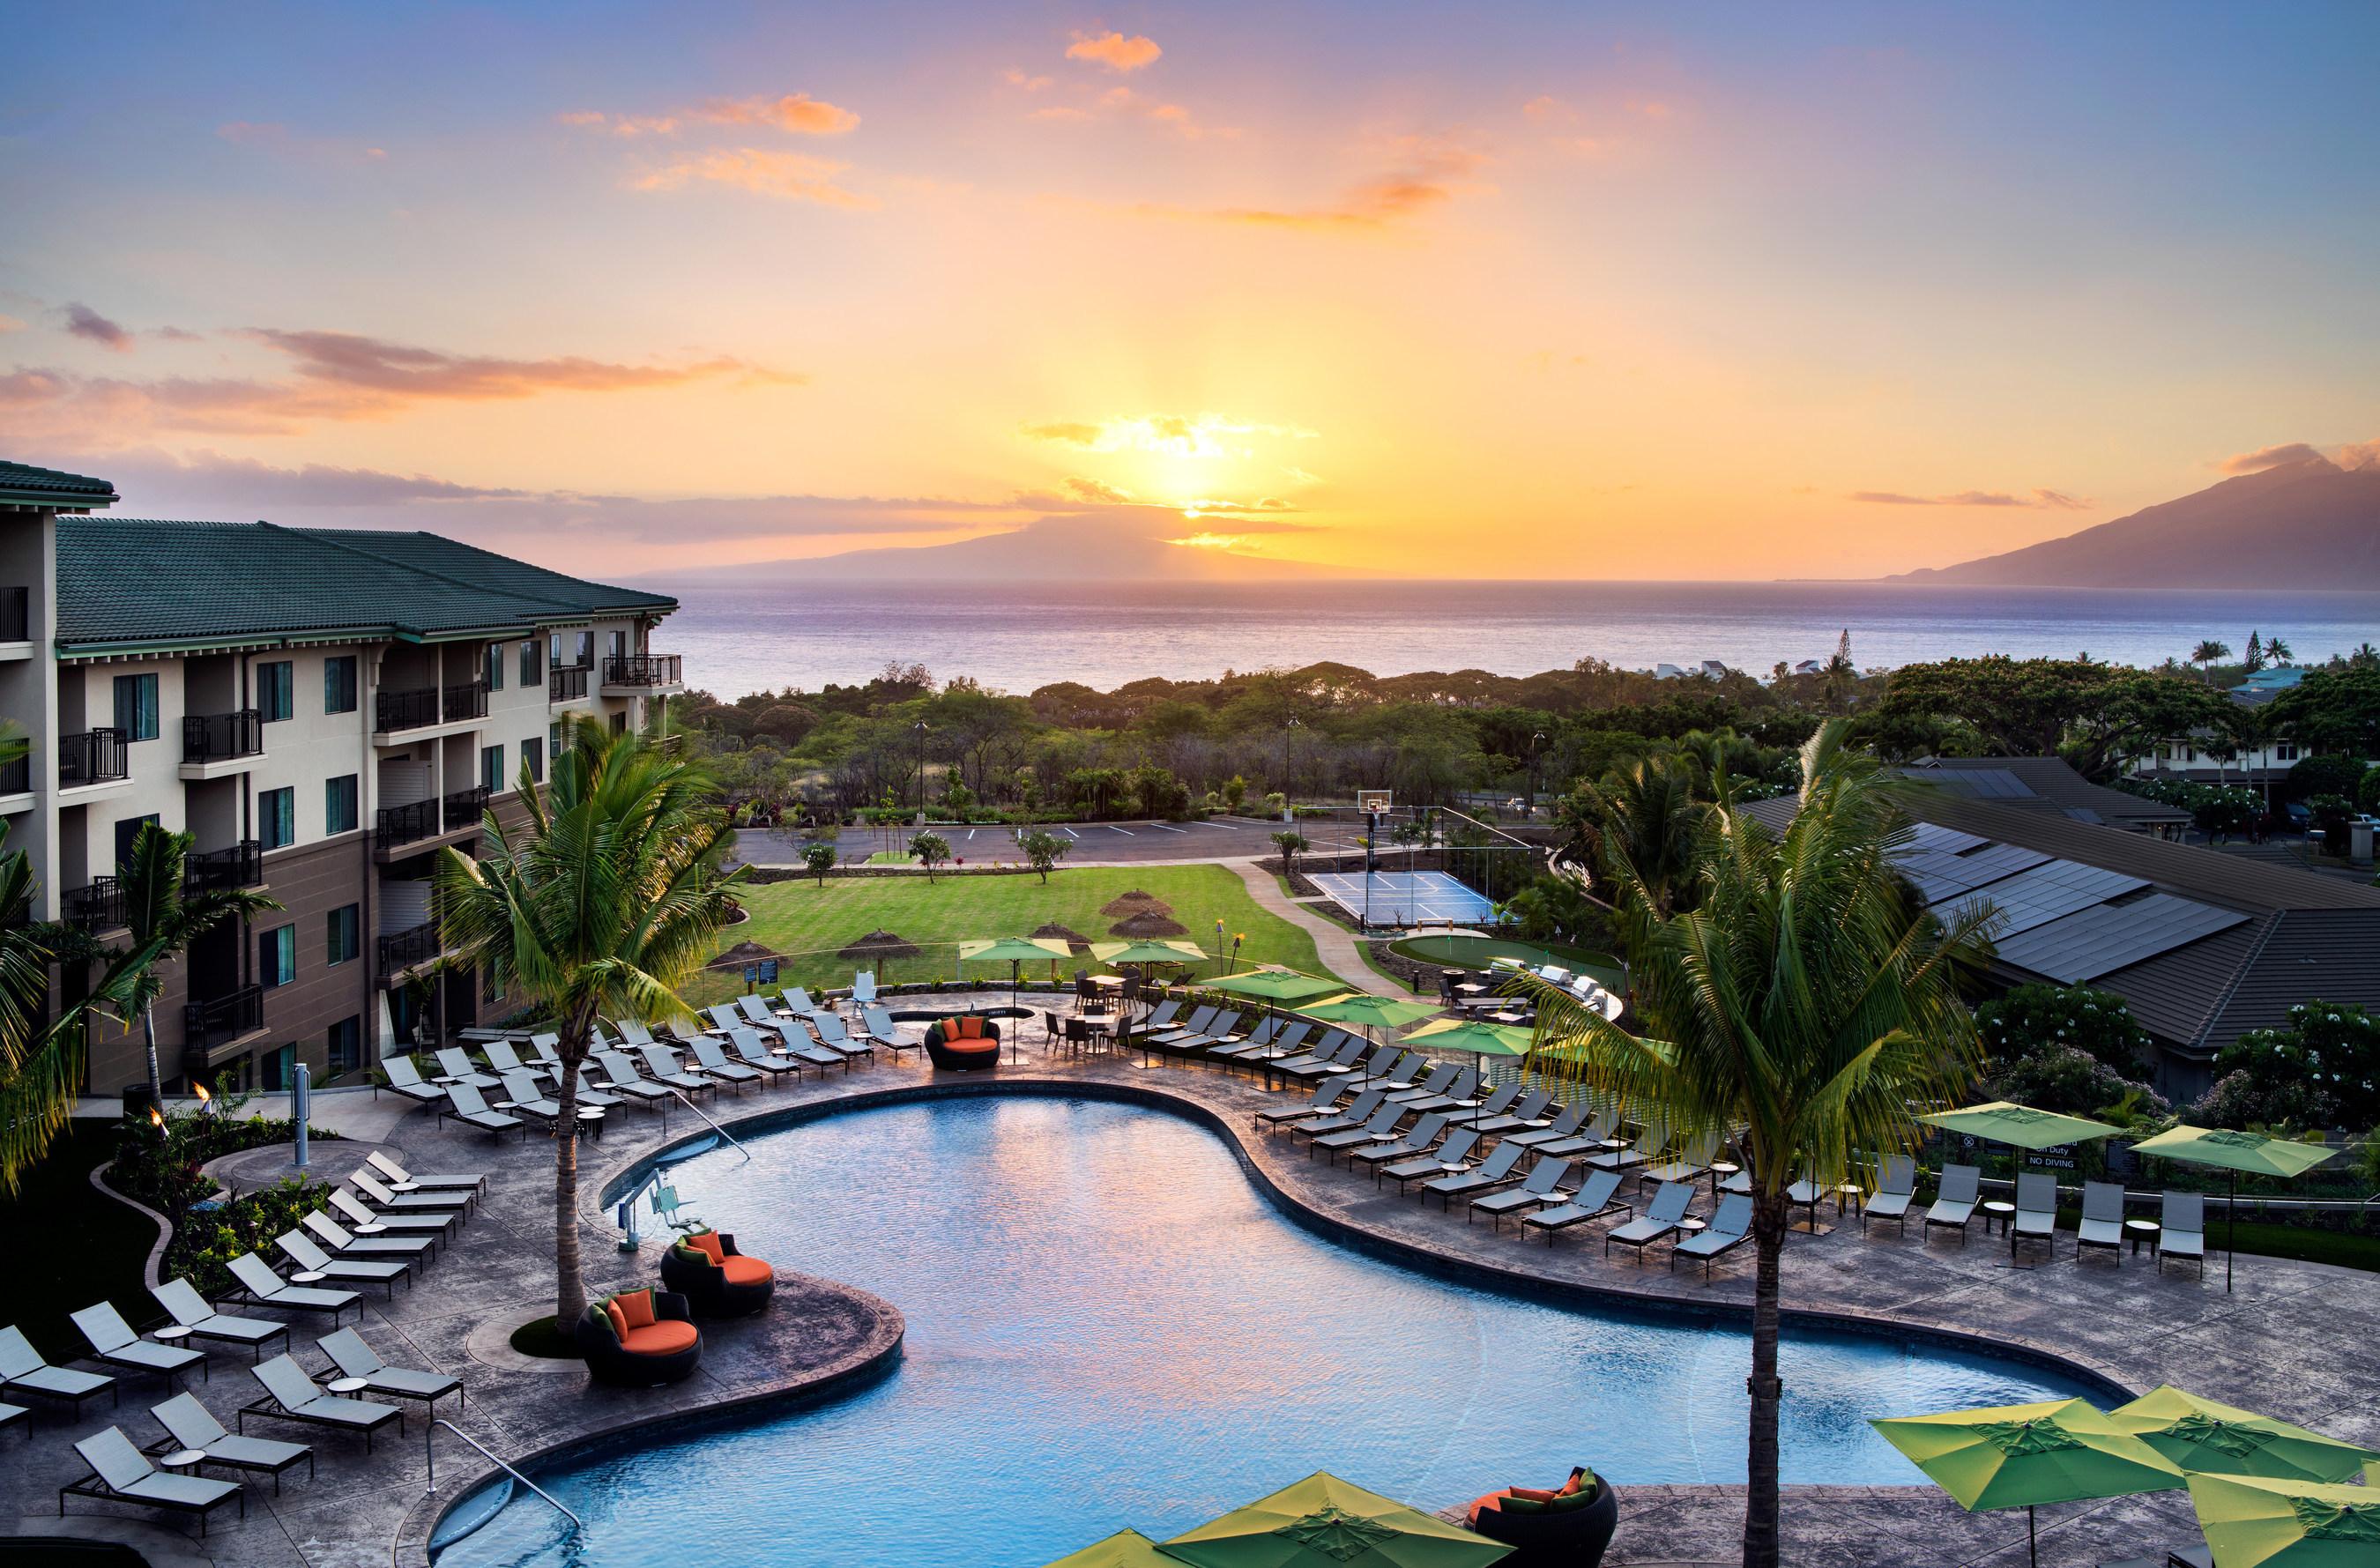 Residence Inn by Marriott Makes Its Aloha Debut in Luxurious Wailea, Hawaii